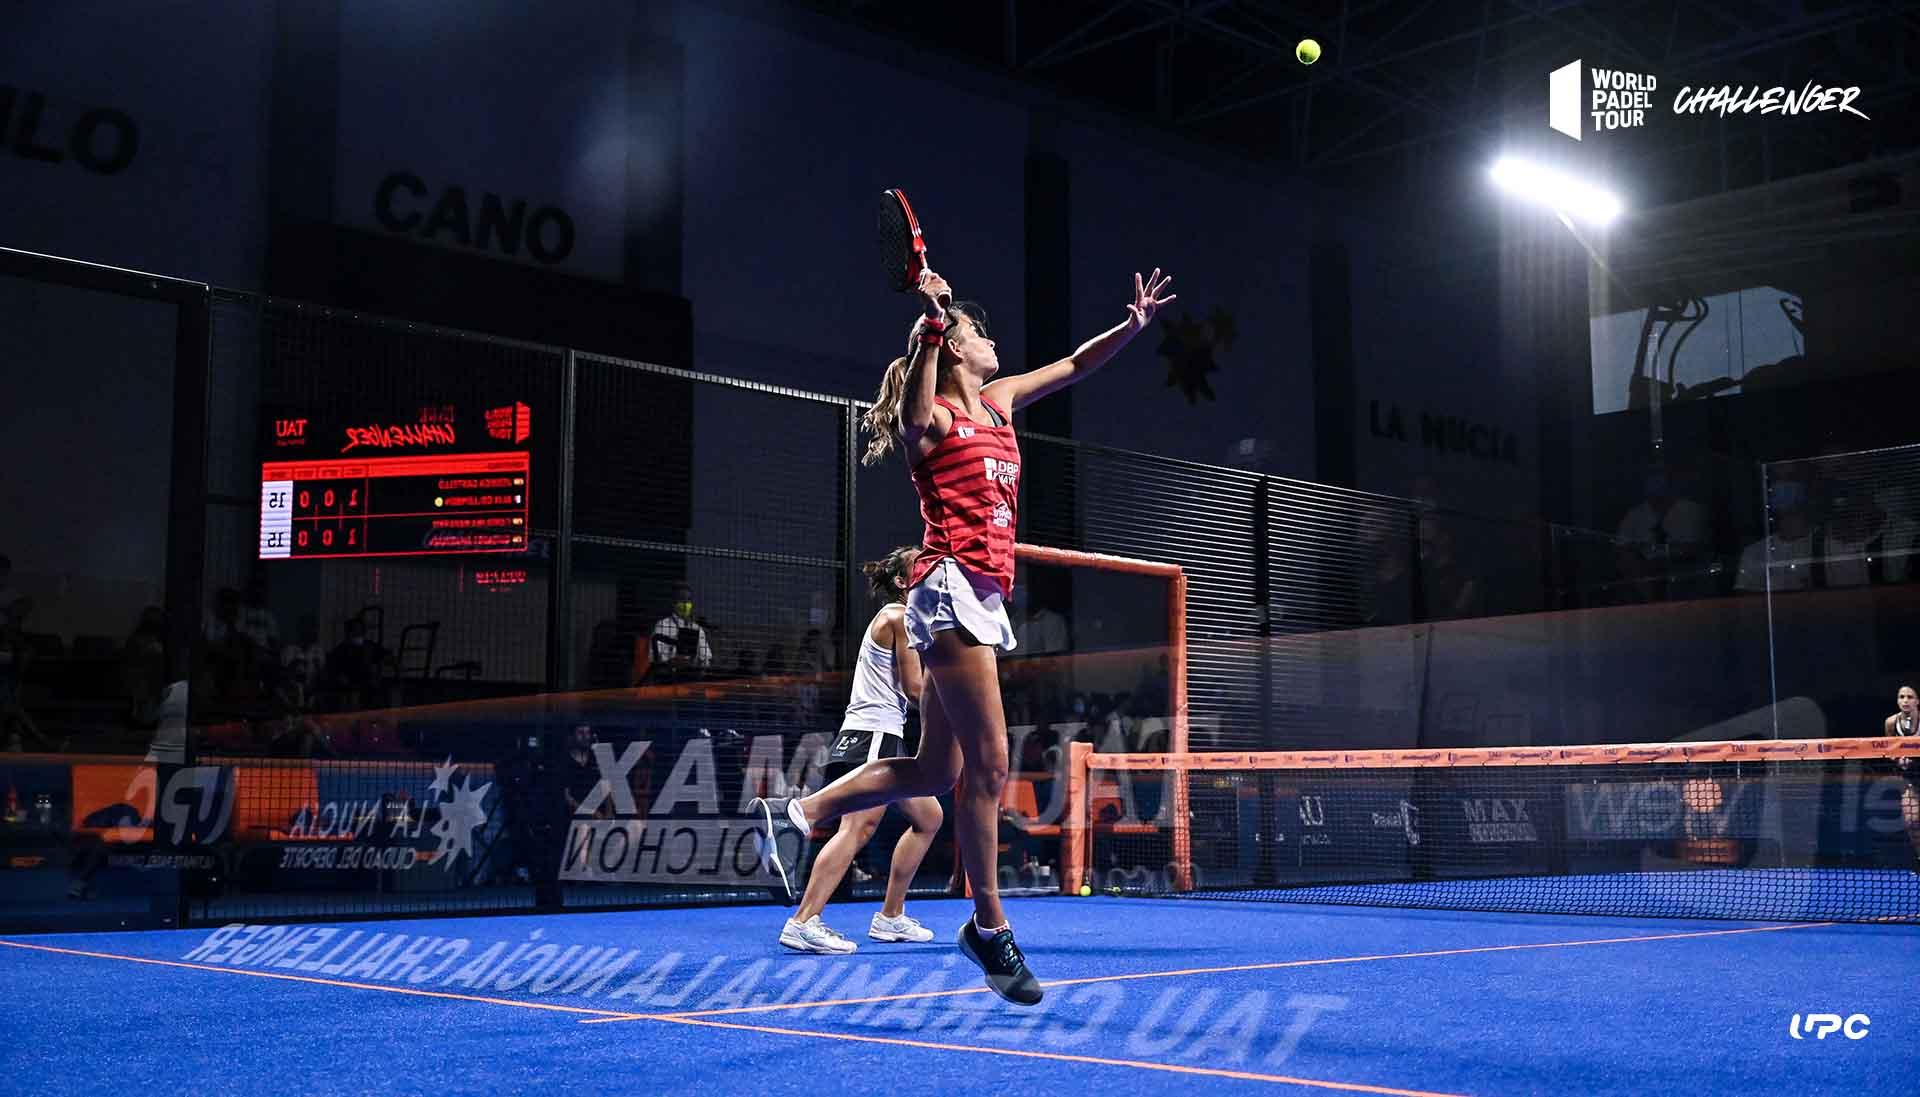 Finał La Nucia Challenger: Castello / Collombon vs Las Heras / Osoro